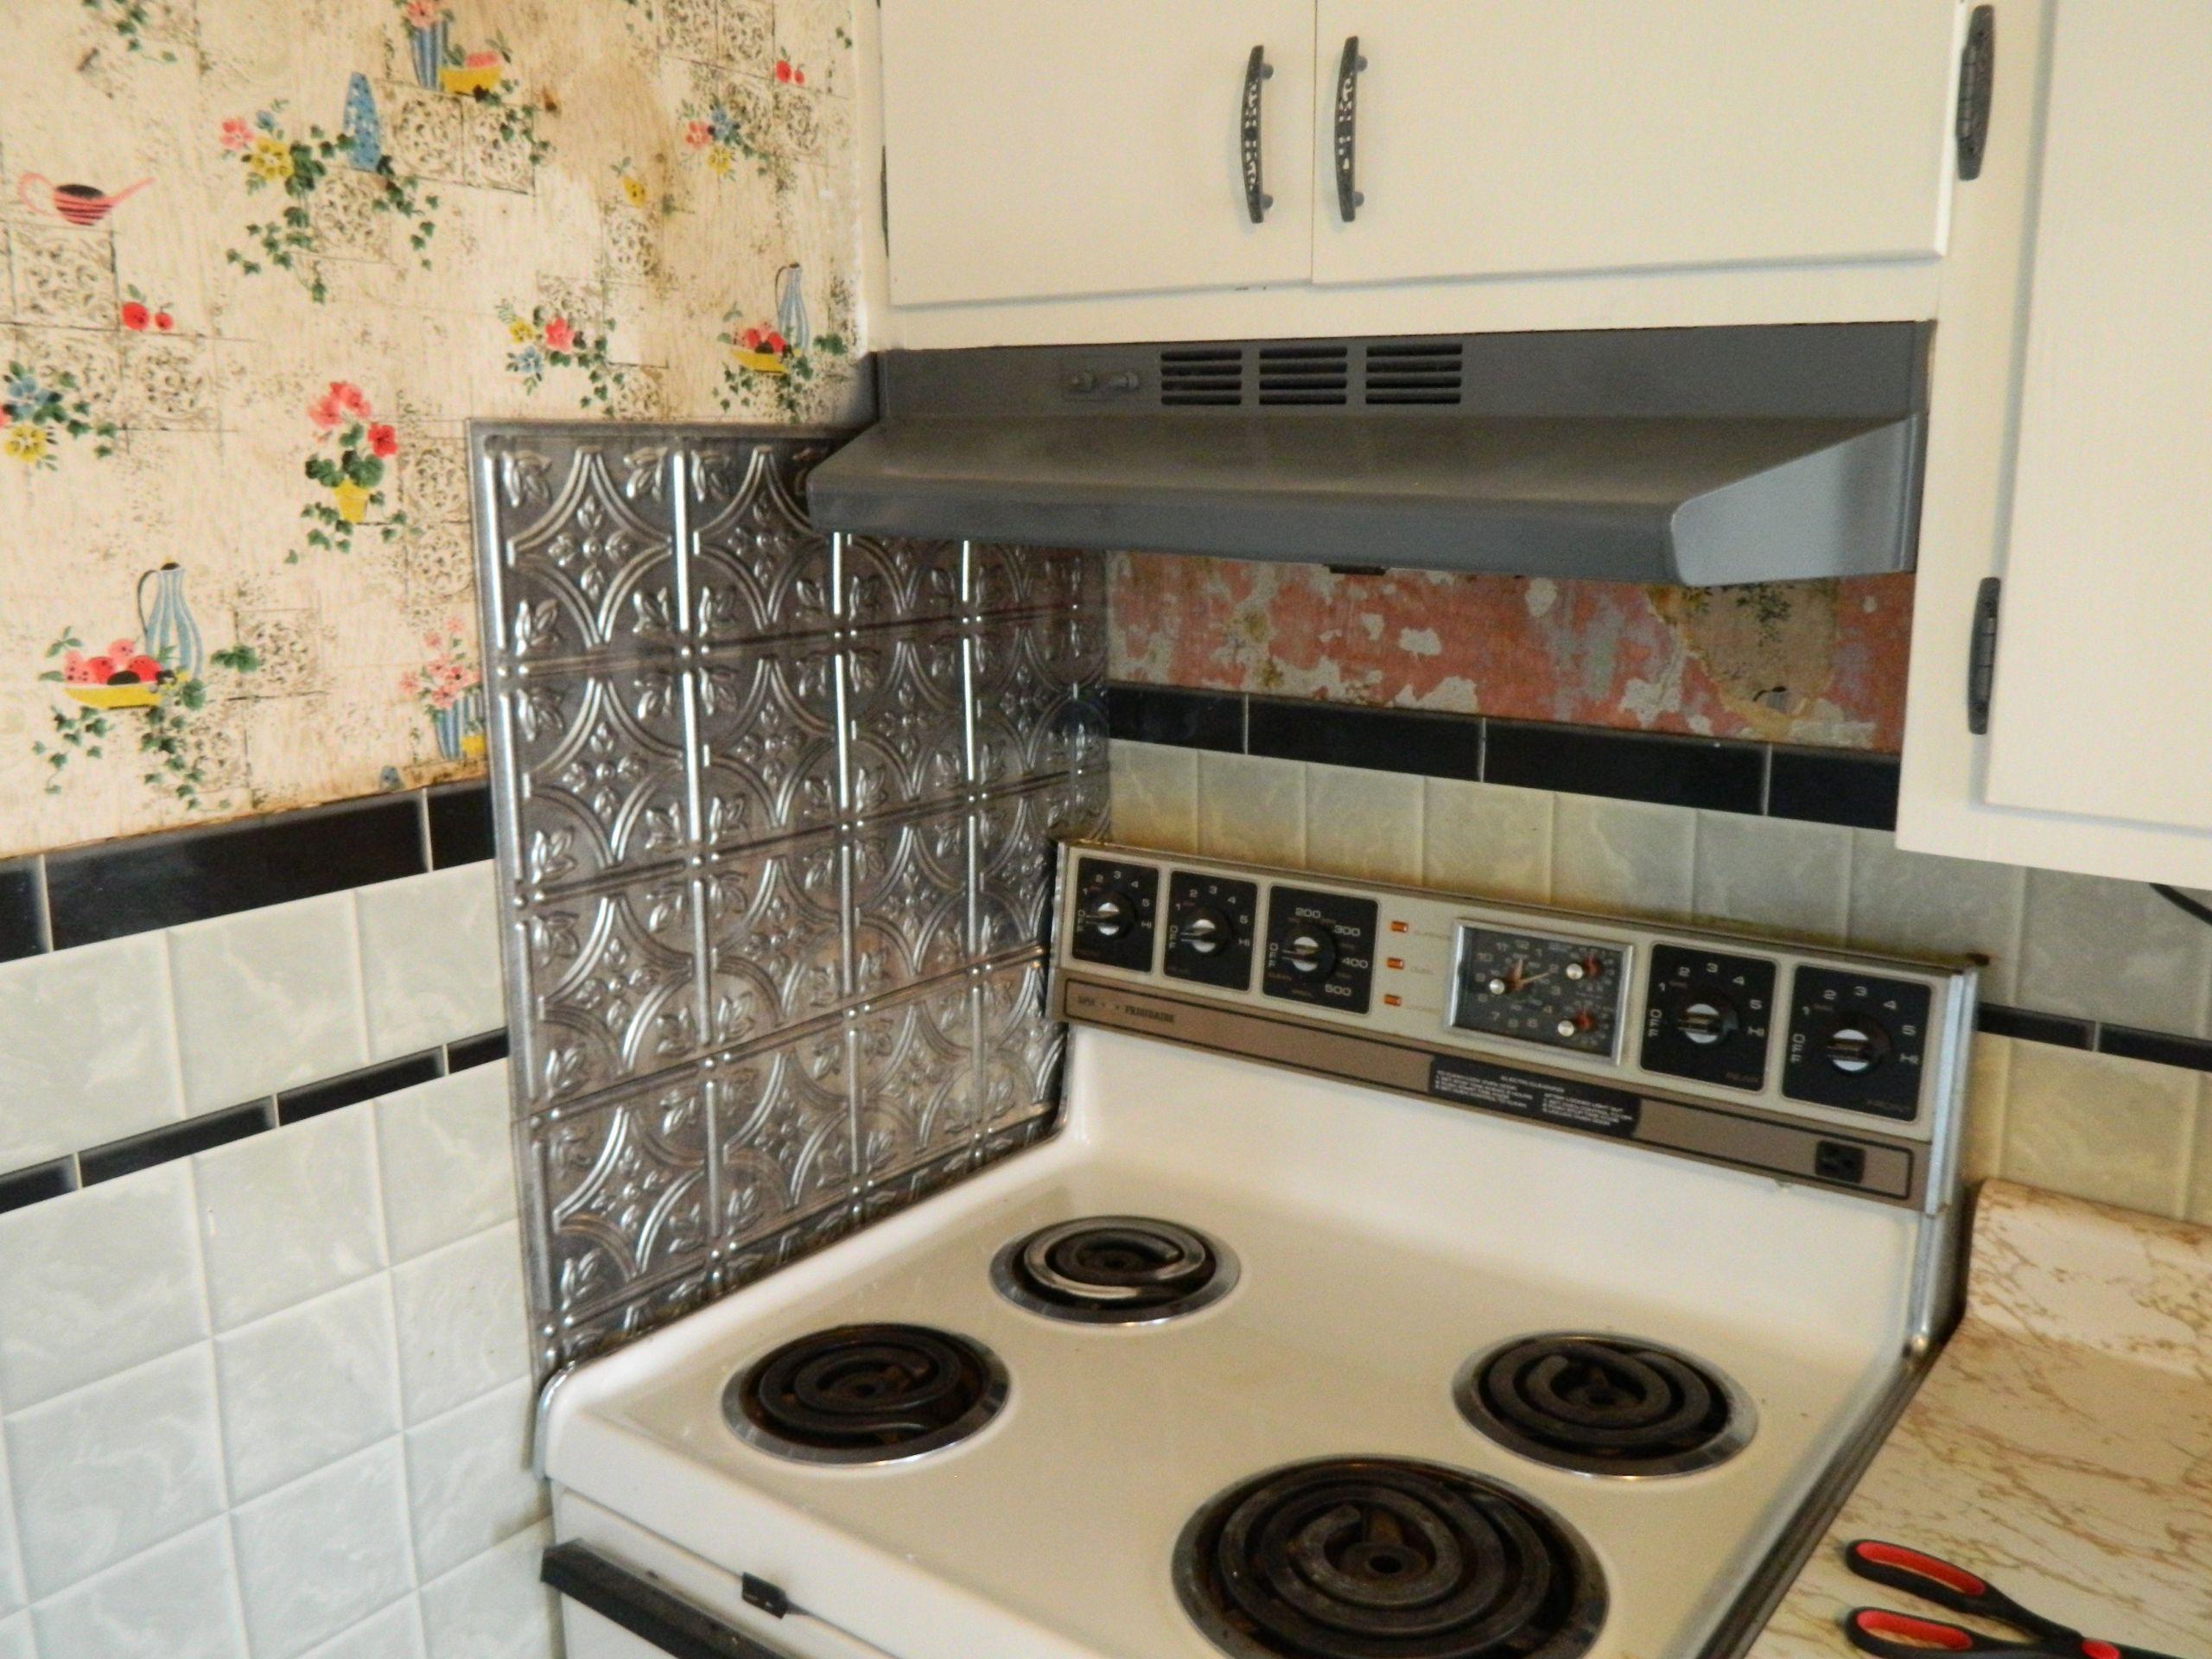 Kitchen Stove Wall Protector  DIY 5 Steps to Kitchen Backsplash – No Grout Involved